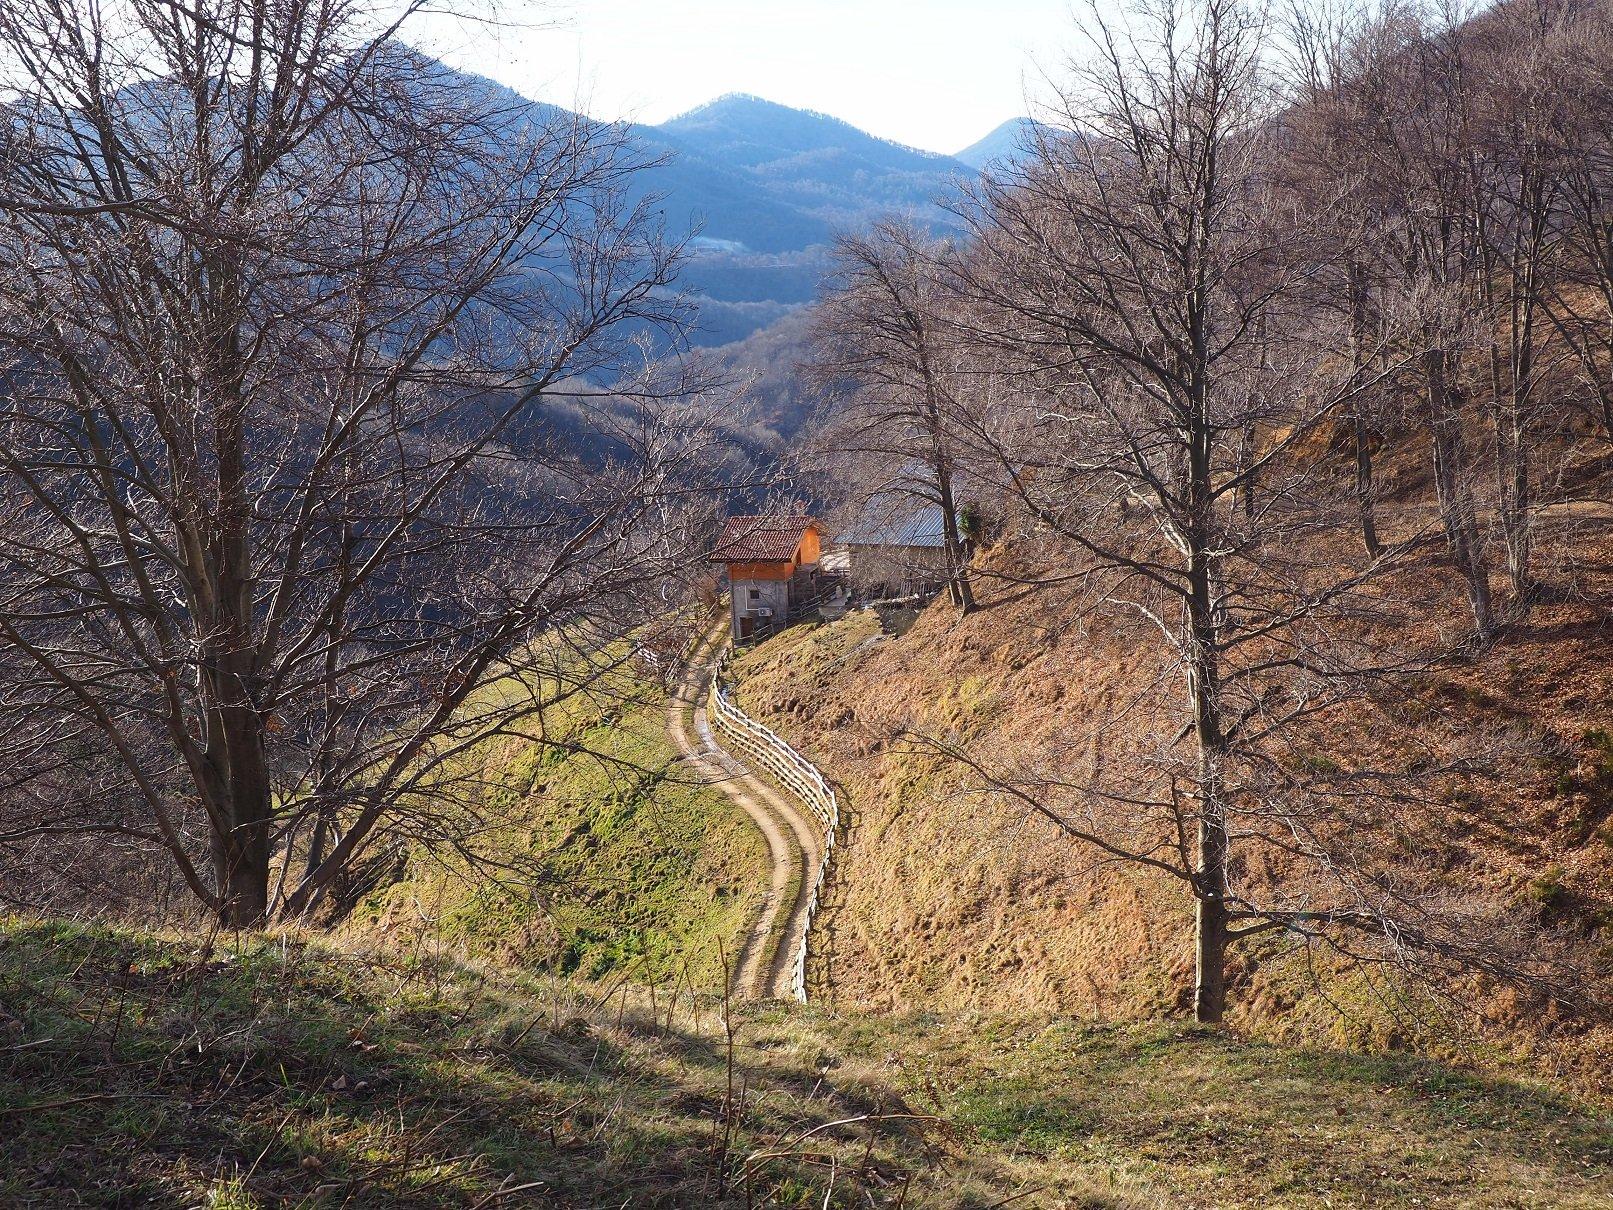 L'Alpe Lincé vista dal sentiero 639.